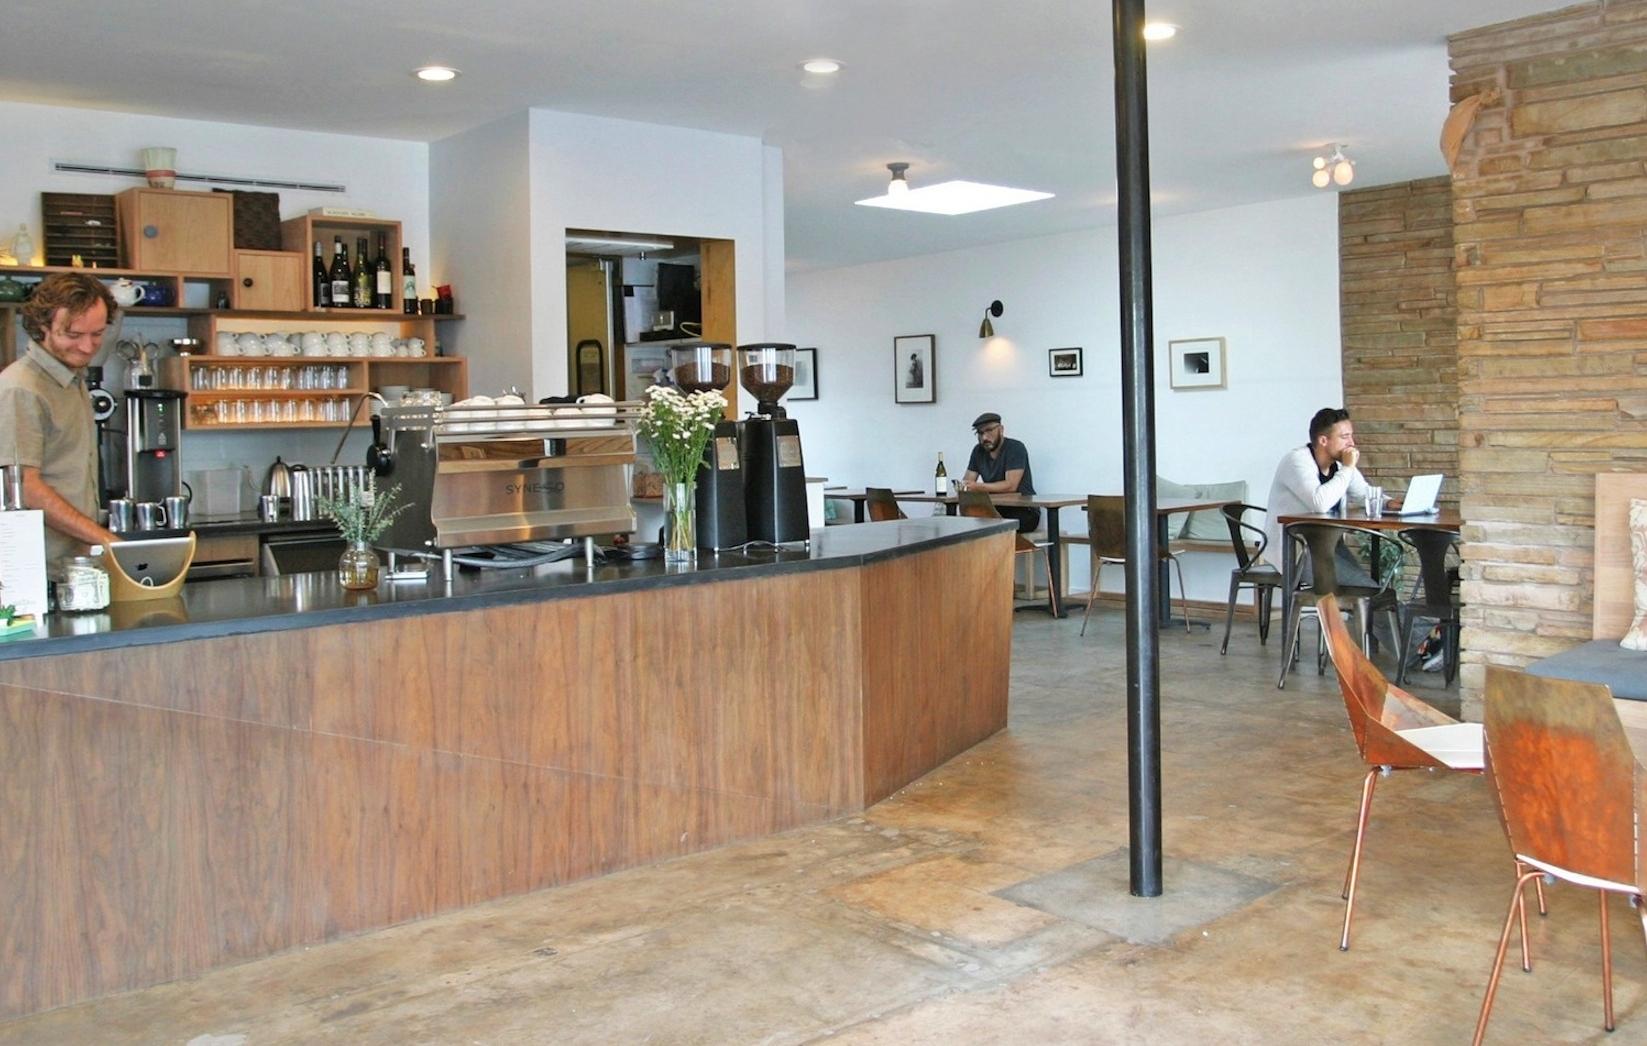 Elizabeth-Baird-Architecture-Patika-coffee bar.jpg